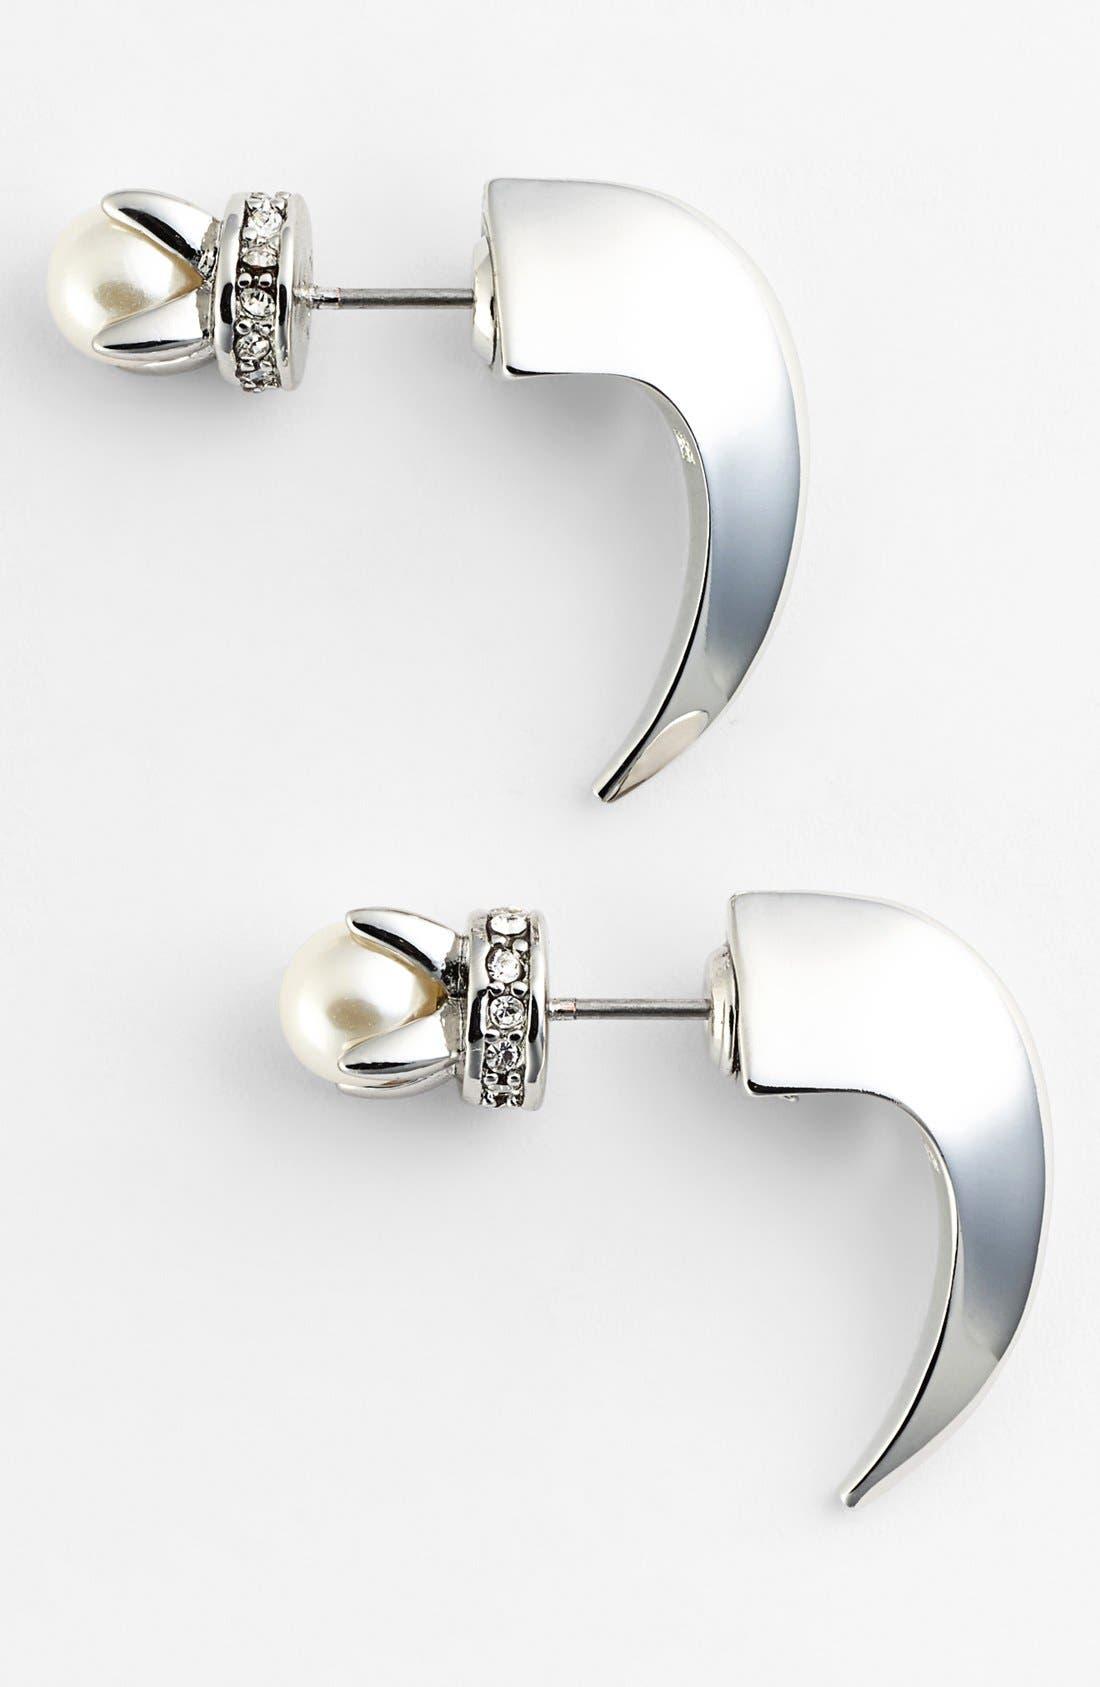 'Curbs' Reversible Hoop Earrings,                         Main,                         color, Silver/ White Pearl/ Clear